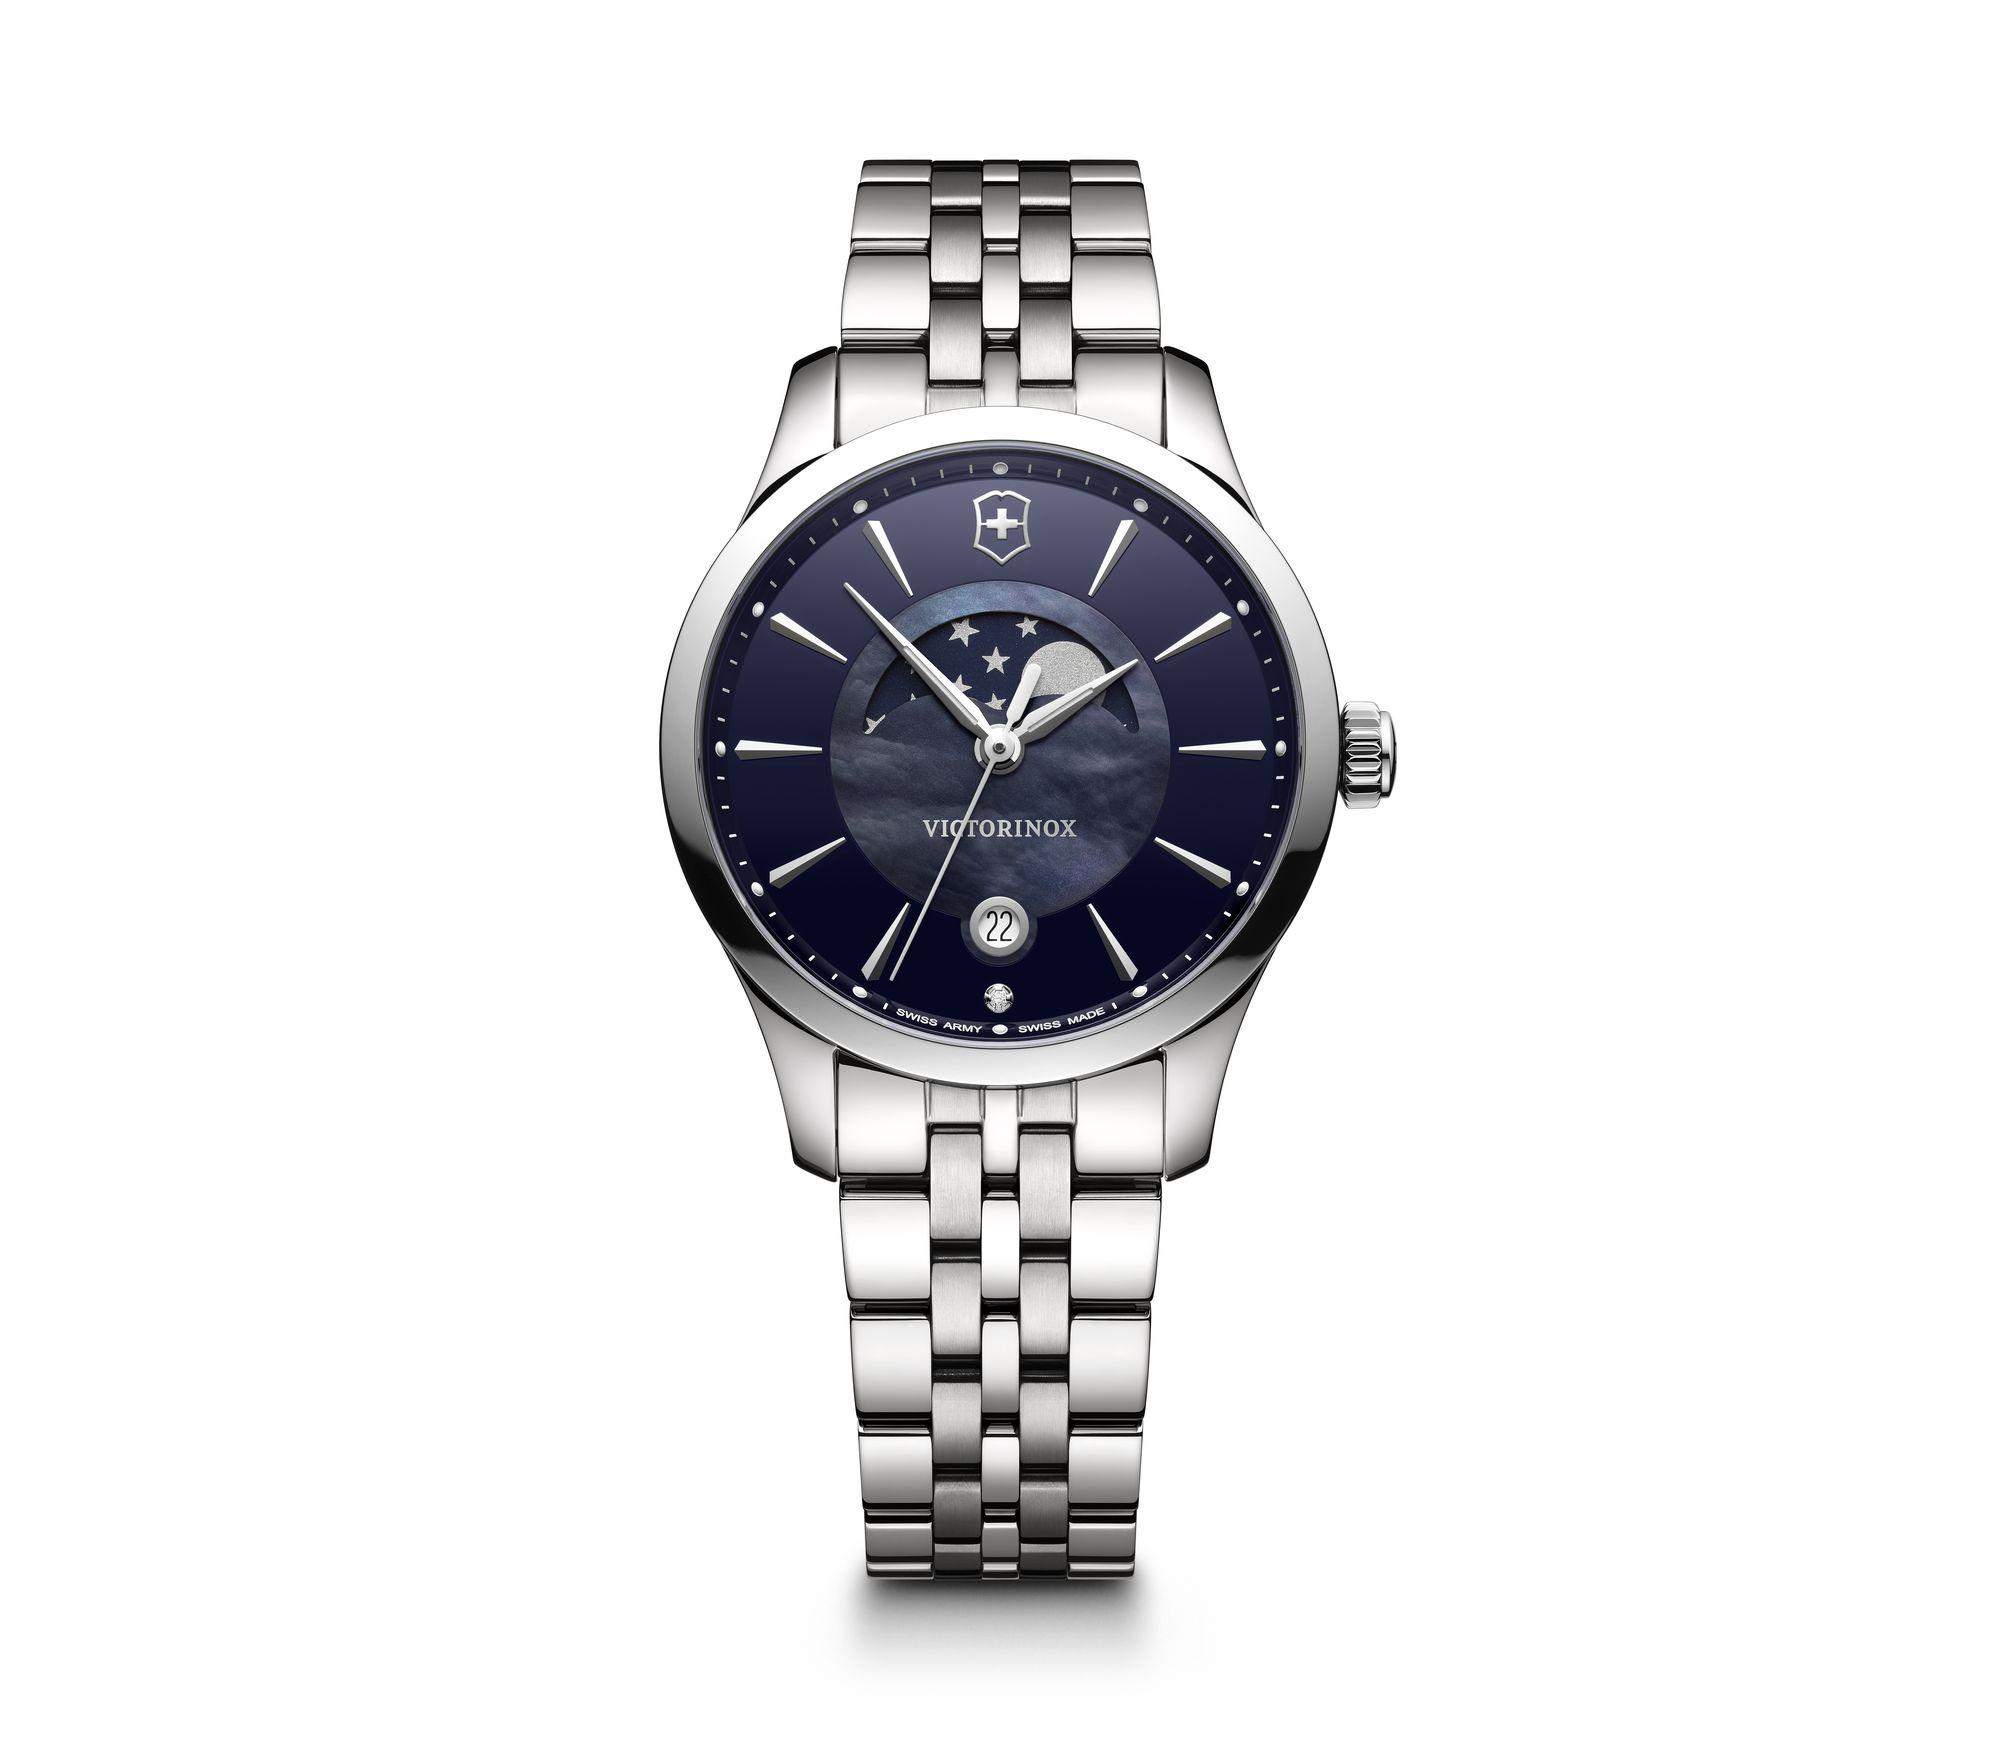 Relógio Victorinox Masculino Azul - Small Moon Phase - 241752